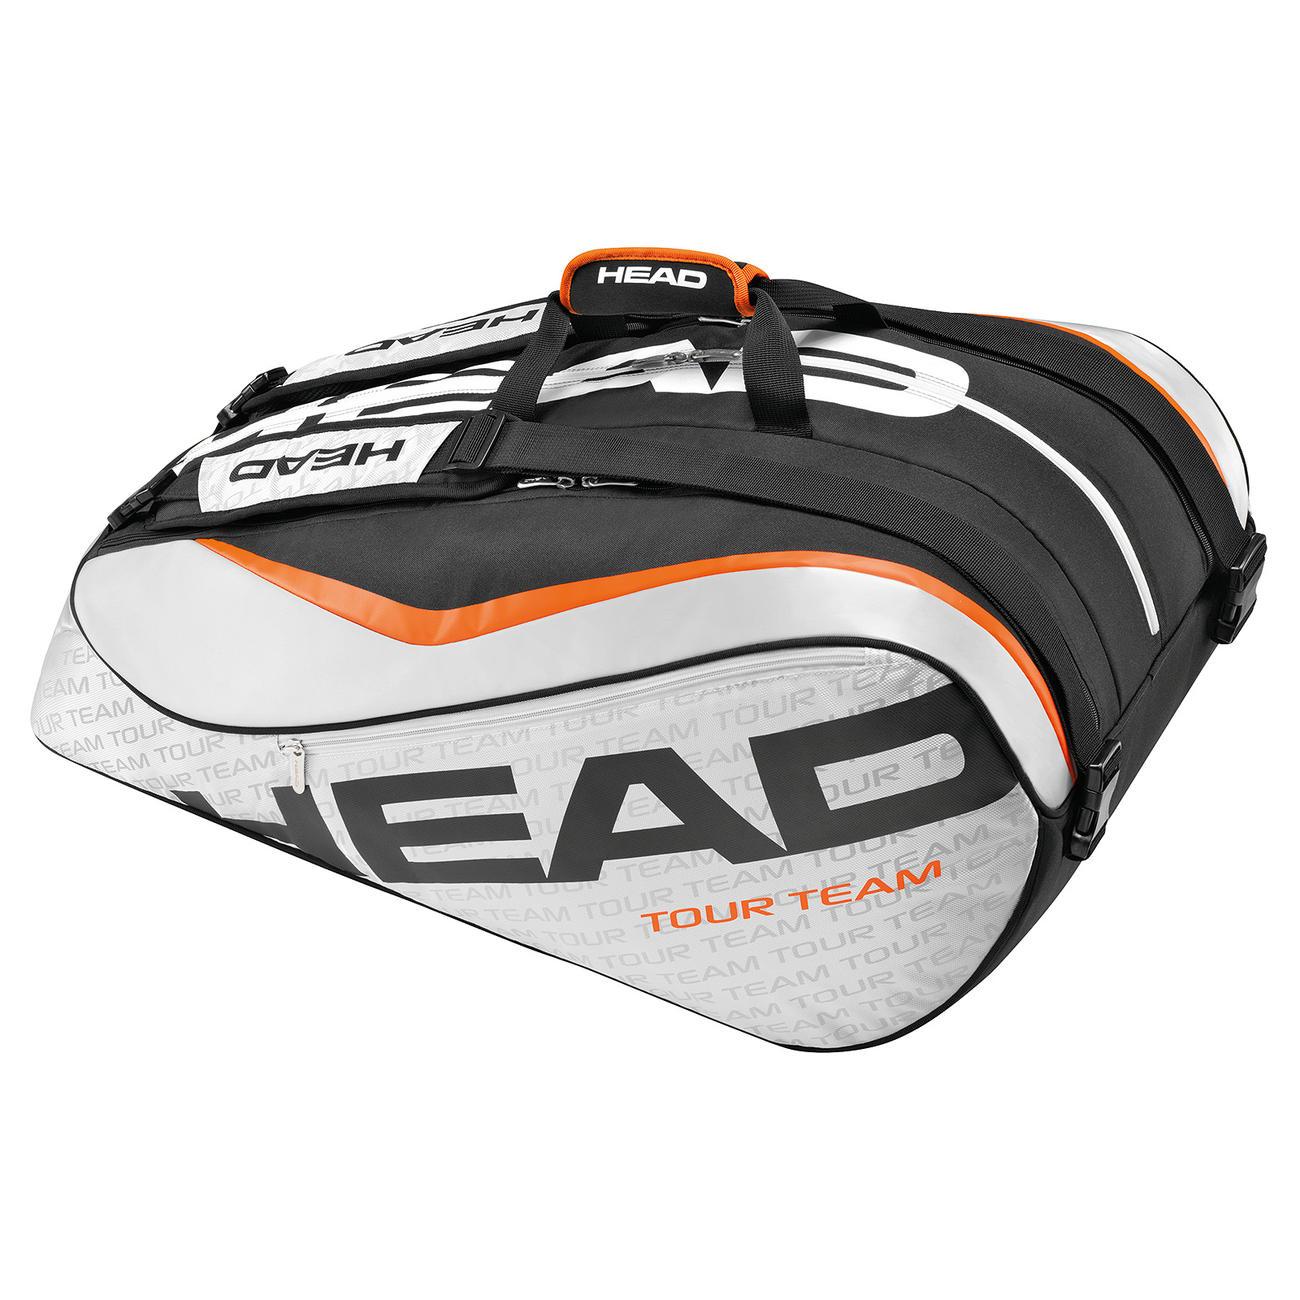 Head Tour Team Monstercombi 12 Racket Bag SS16  SilverBlack